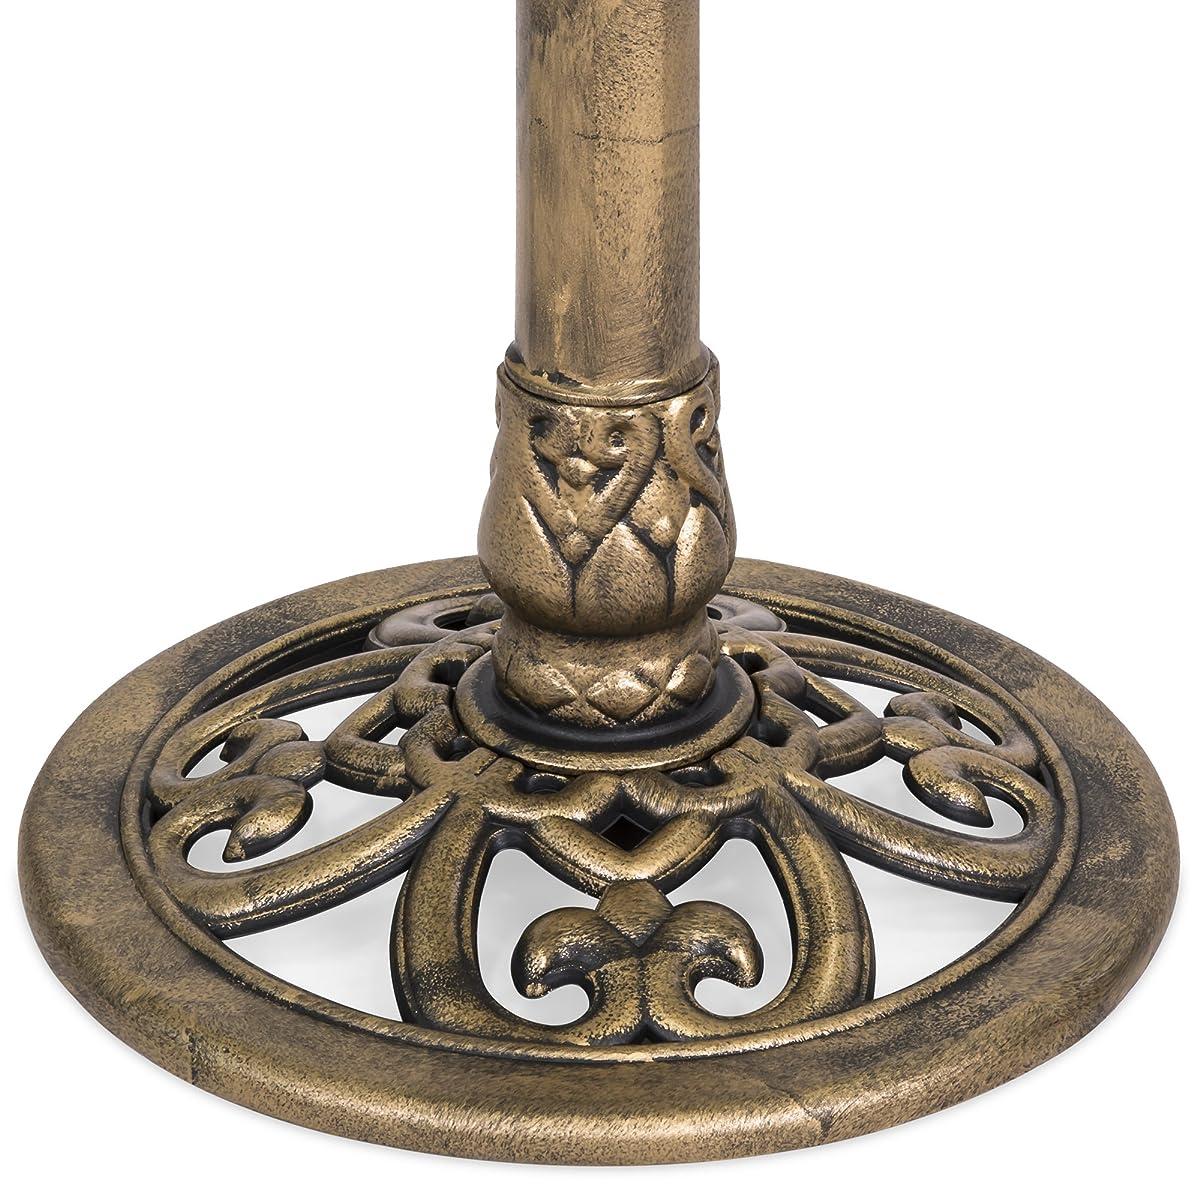 Best Choice Products Pedestal Bird Bath w/ Scroll Accent, Sitting Pair of Birds - Antique Gold